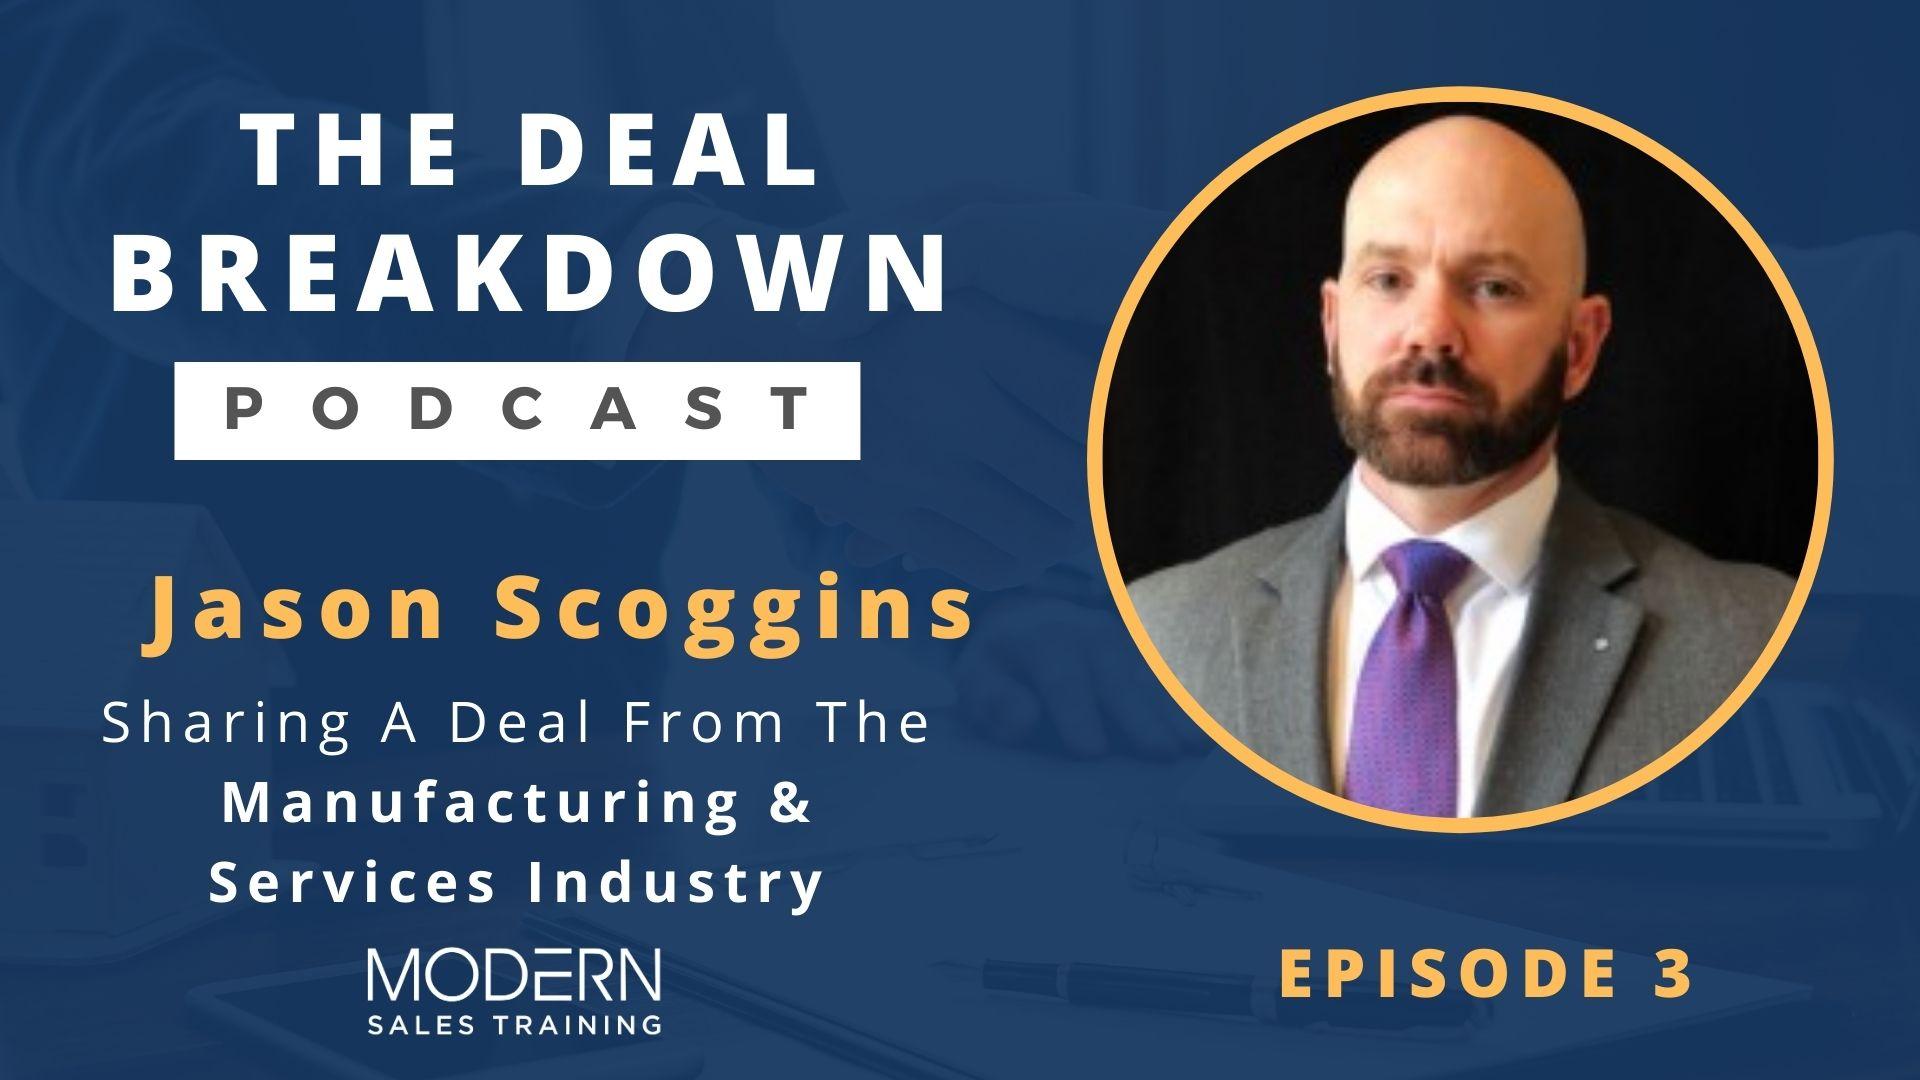 The-Deal-Breakdown-Podcast-Modern-Sales-Training-Jason-Scoggins